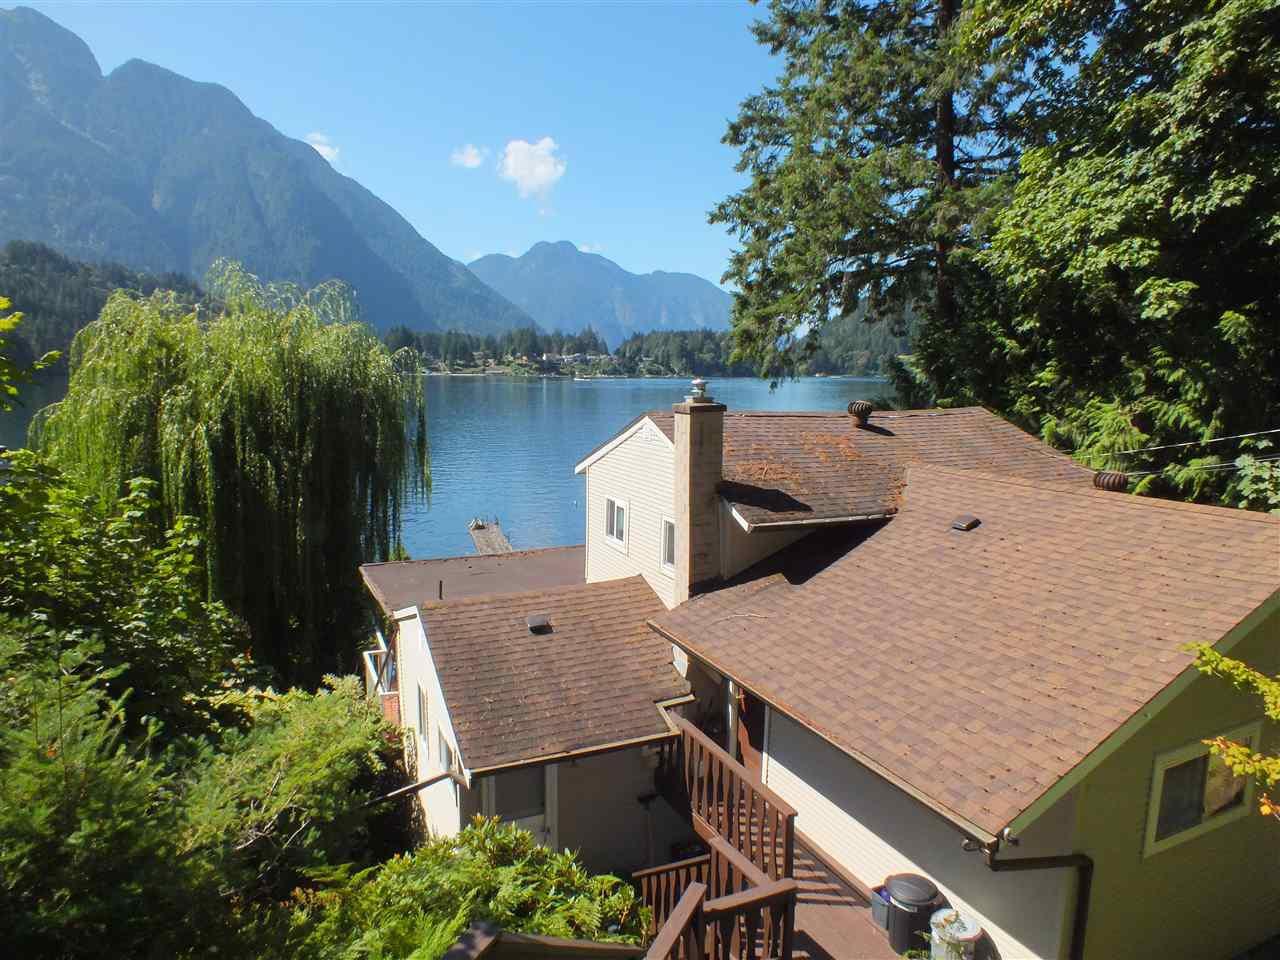 Main Photo: 66757 KAWKAWA LAKE Road in Hope: Hope Kawkawa Lake House for sale : MLS®# R2491053